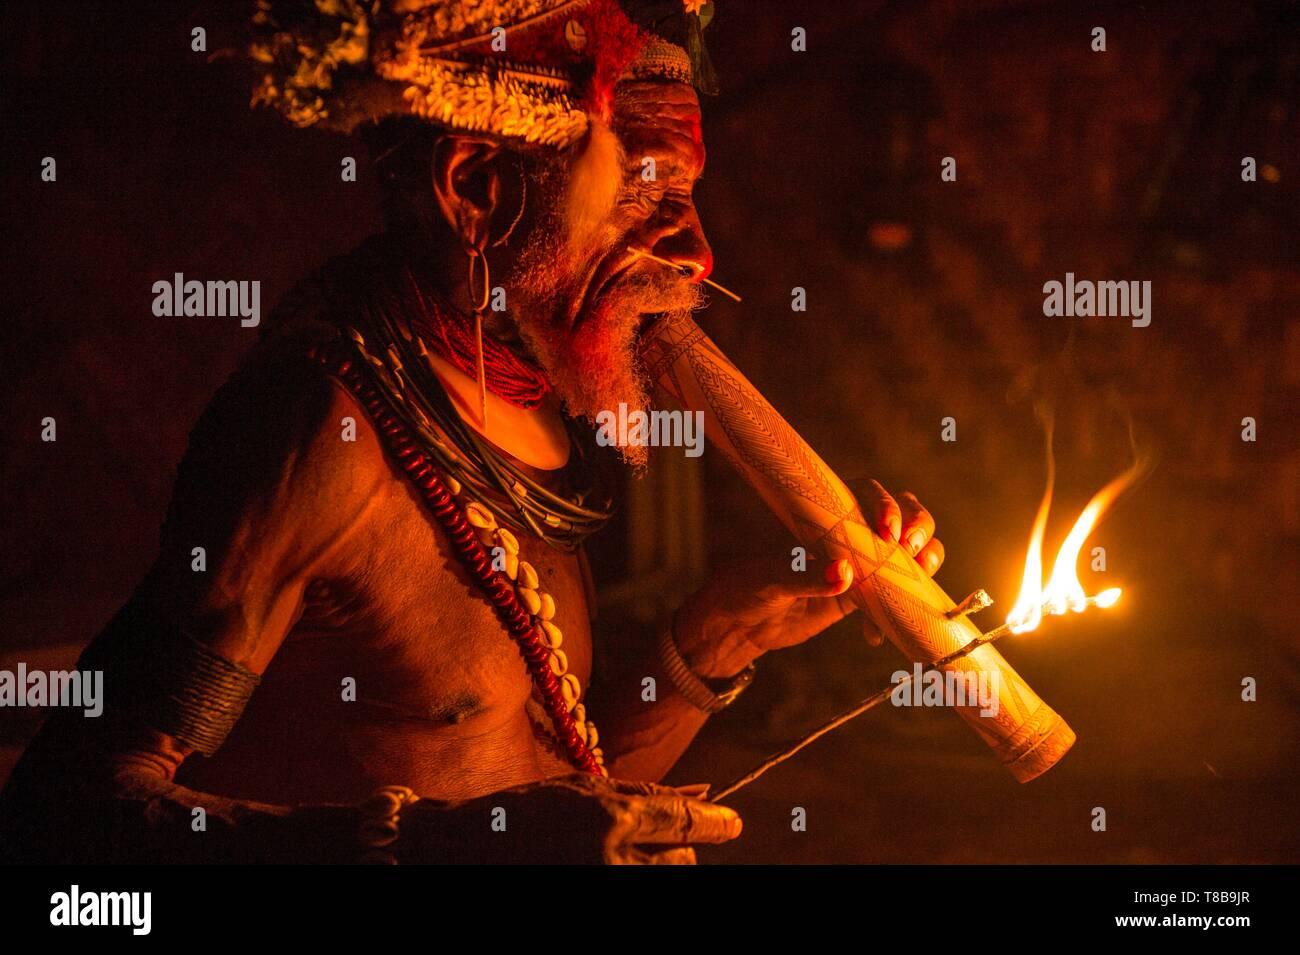 Papua New Guinea, Hela province, Huli tribe, Tari area, Kobe Tumbiali village, old chief Mene smoking with a pipe - Stock Image